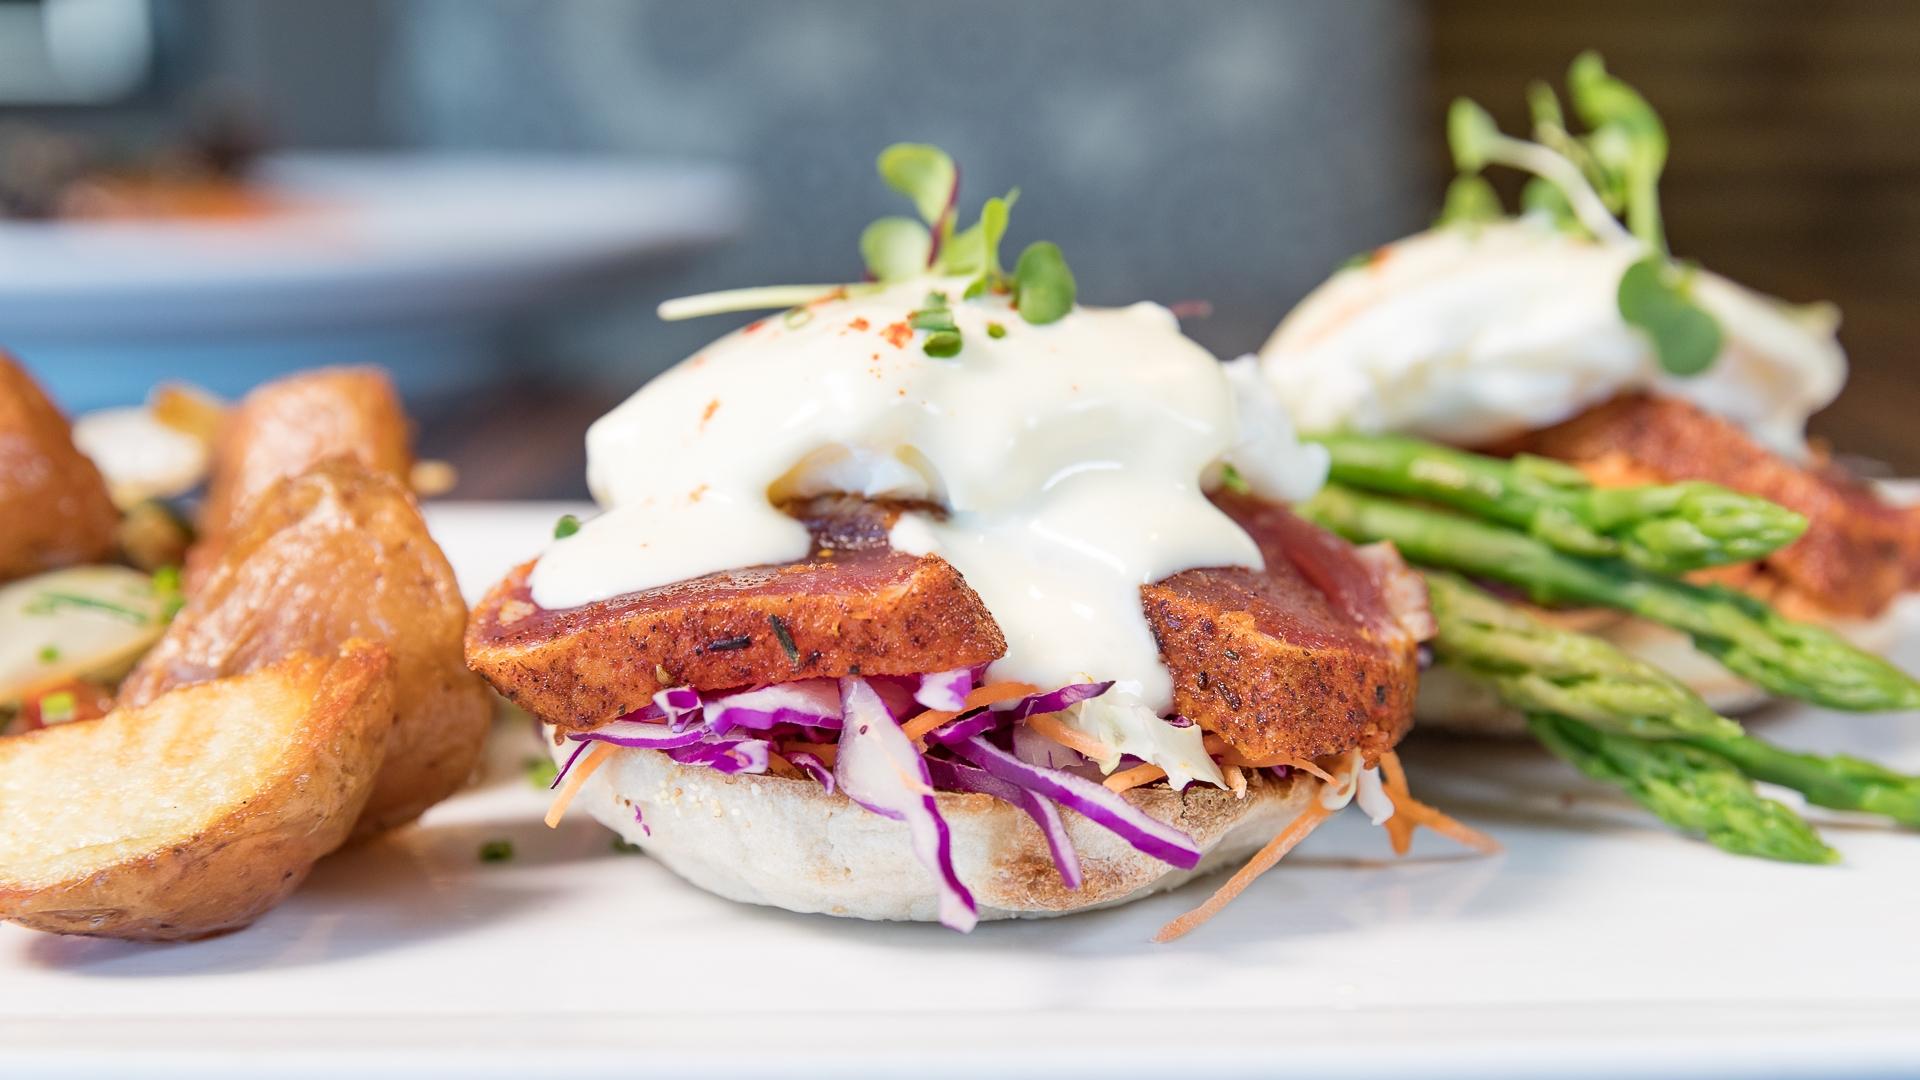 Roy's Kaanapali: Ahi Benedict | Roy's Blackened Ahi, Ponzu Veg, Grilled Asparagus, Red Bliss Fried Potatoes, Yuzu-Hollandaise